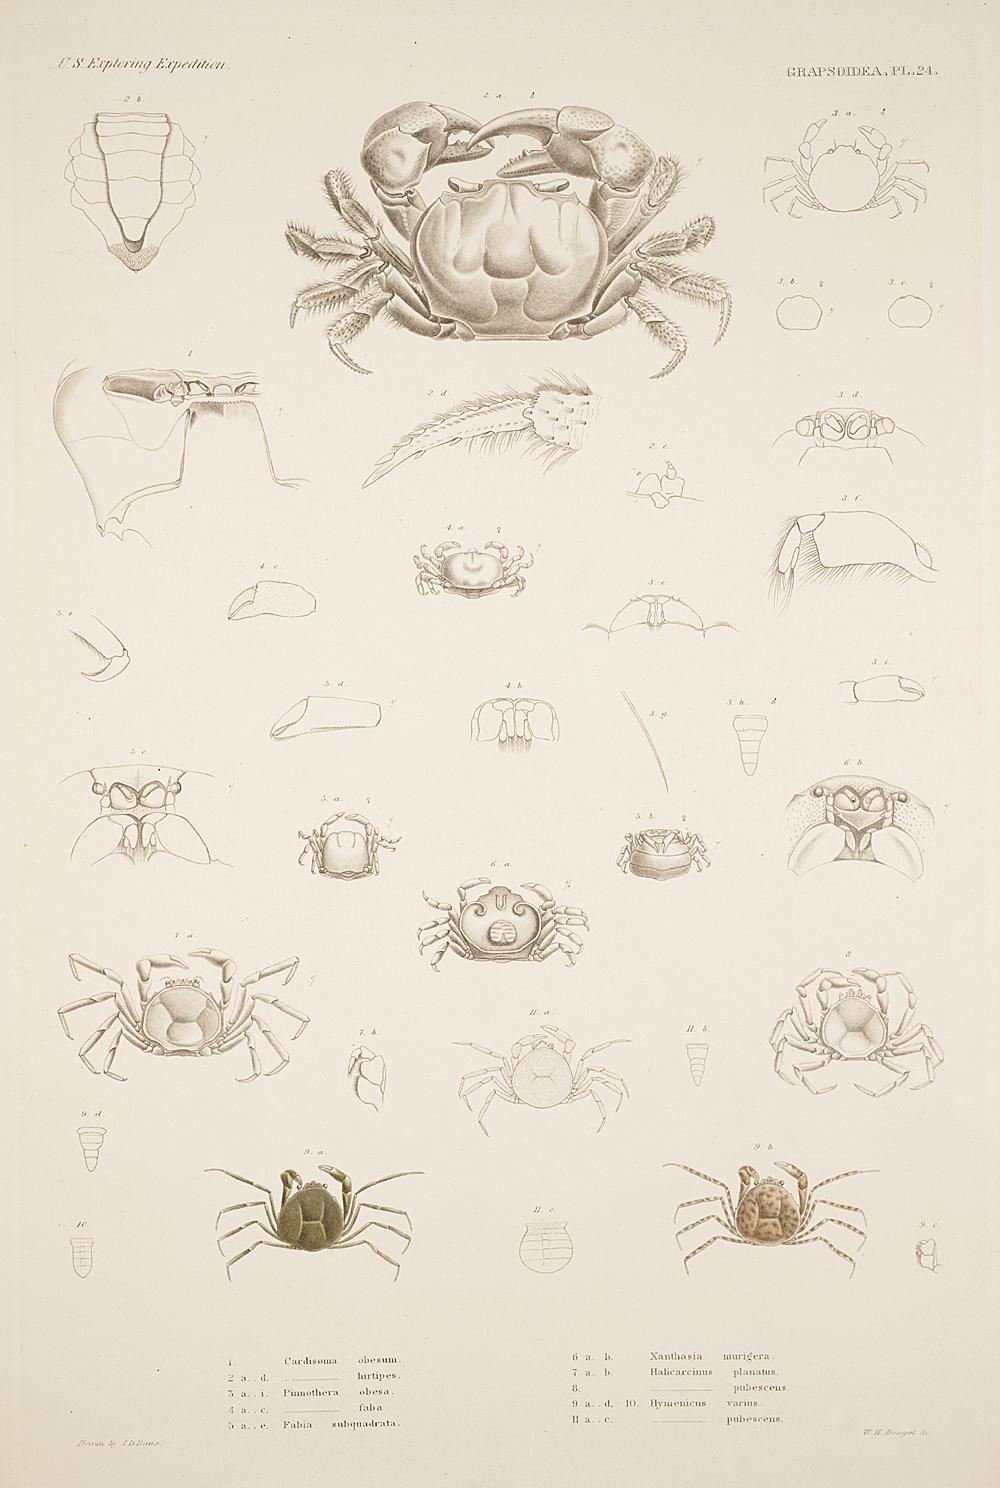 Grapstoidea. Pl. 24,  Image number:SIL19-21-081b